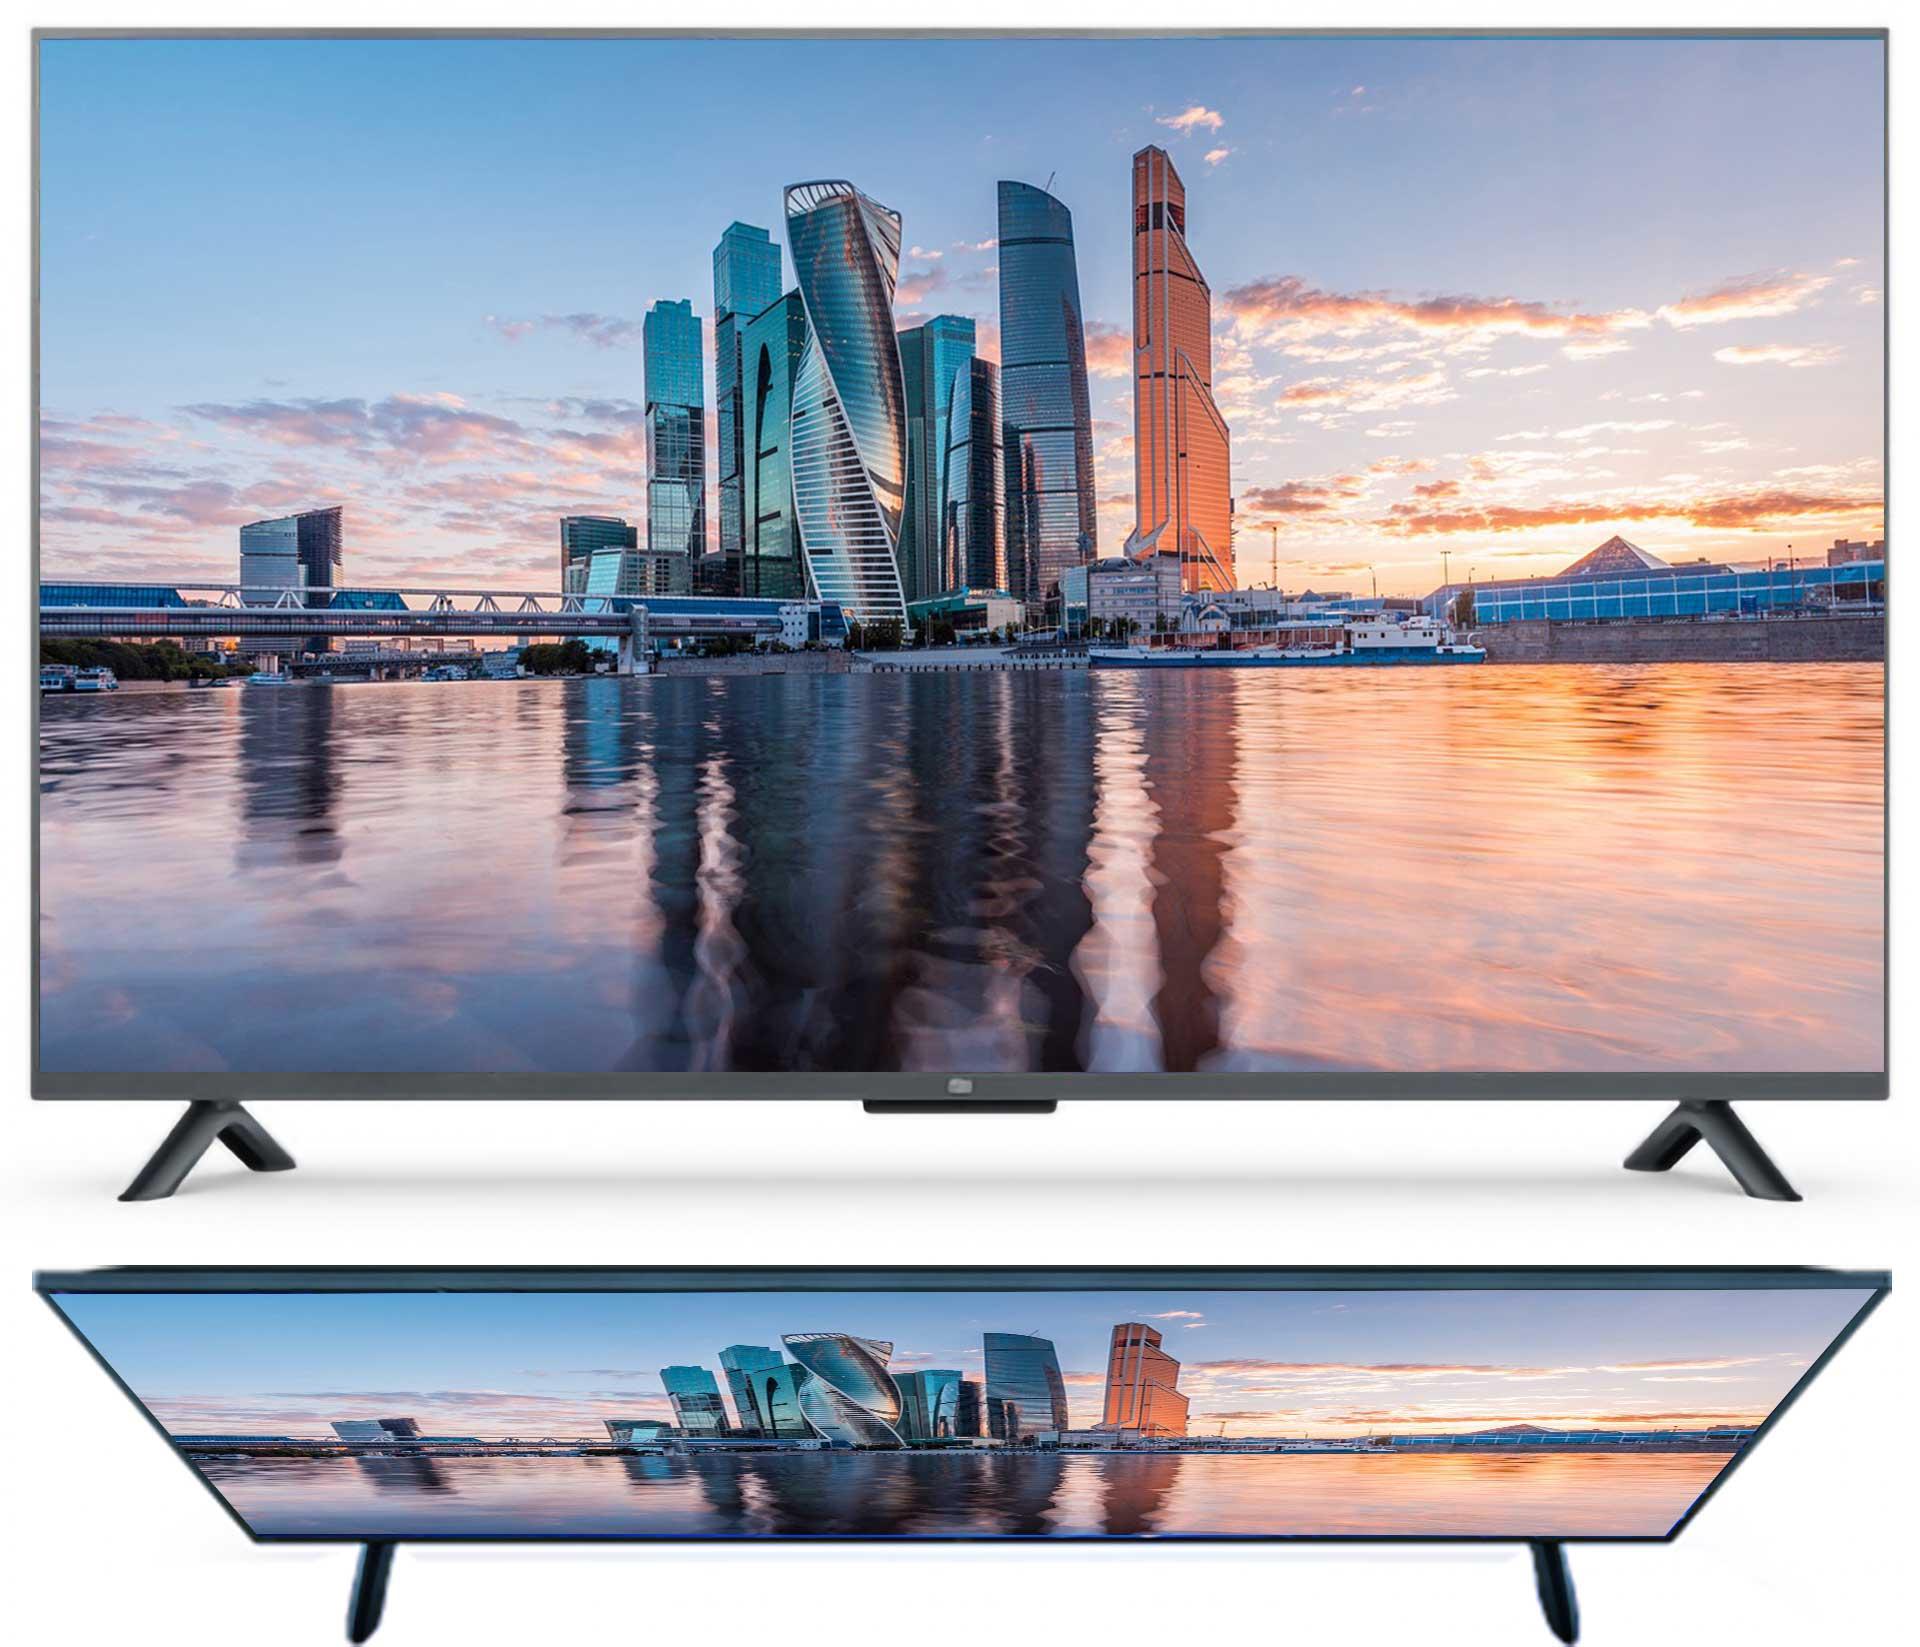 Xiaomi Mi TV 4S 55 T2 54.6